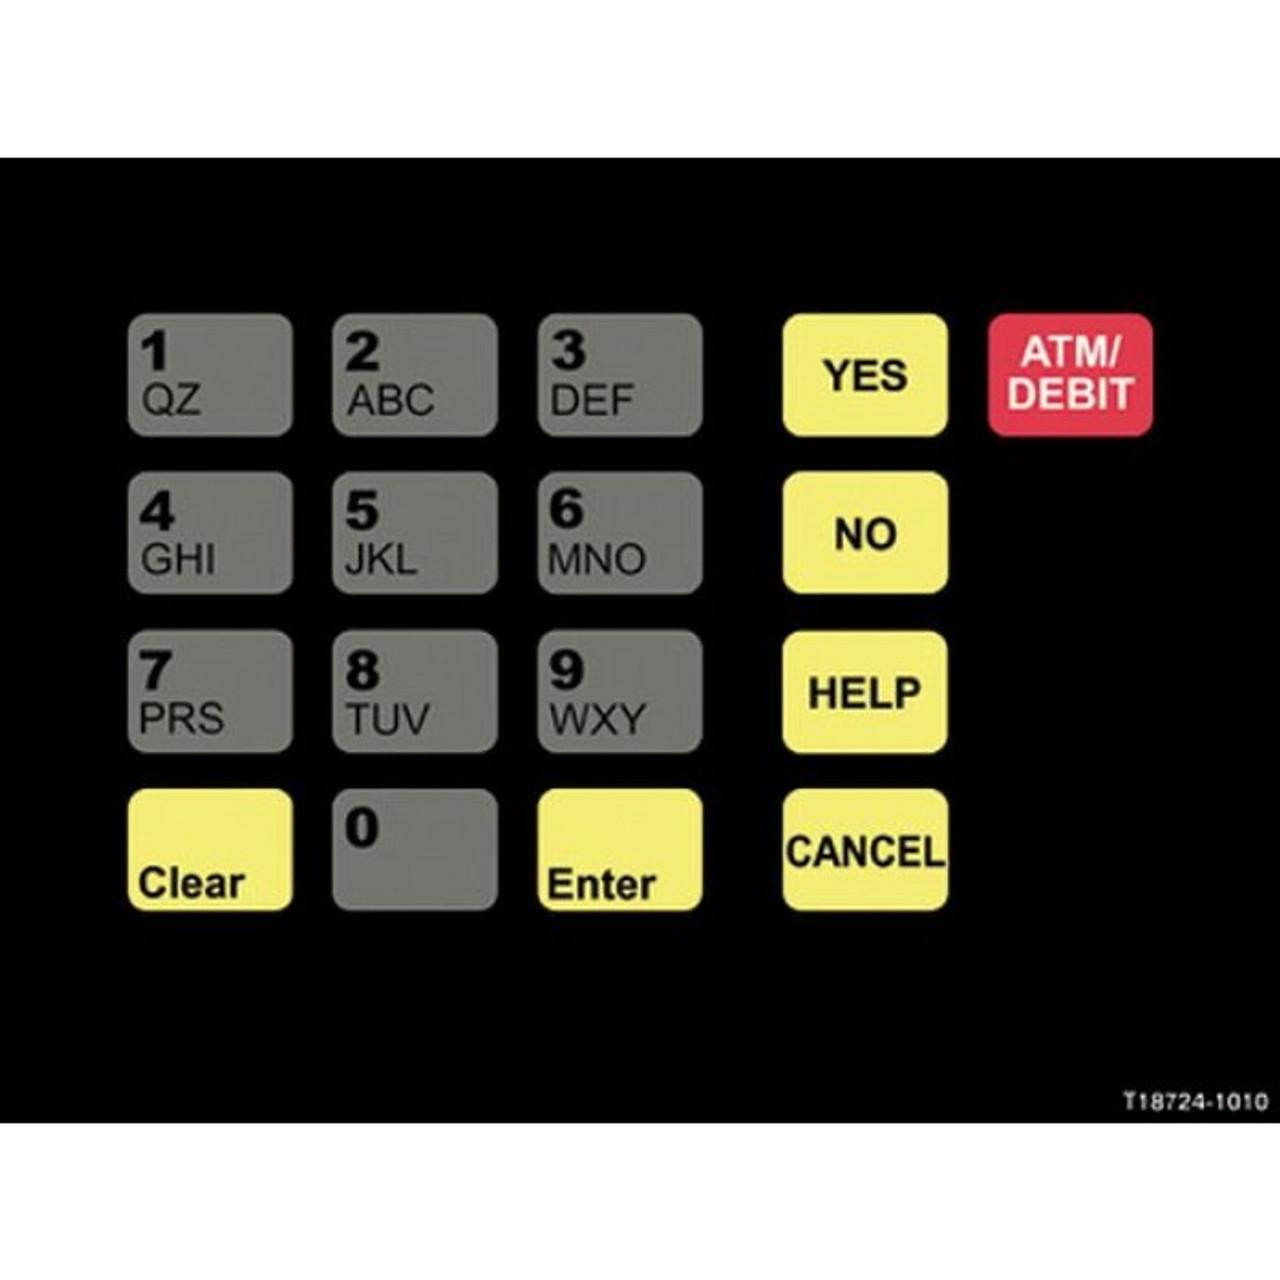 T18724-1010 - Unocal Crind Keypad Overlay